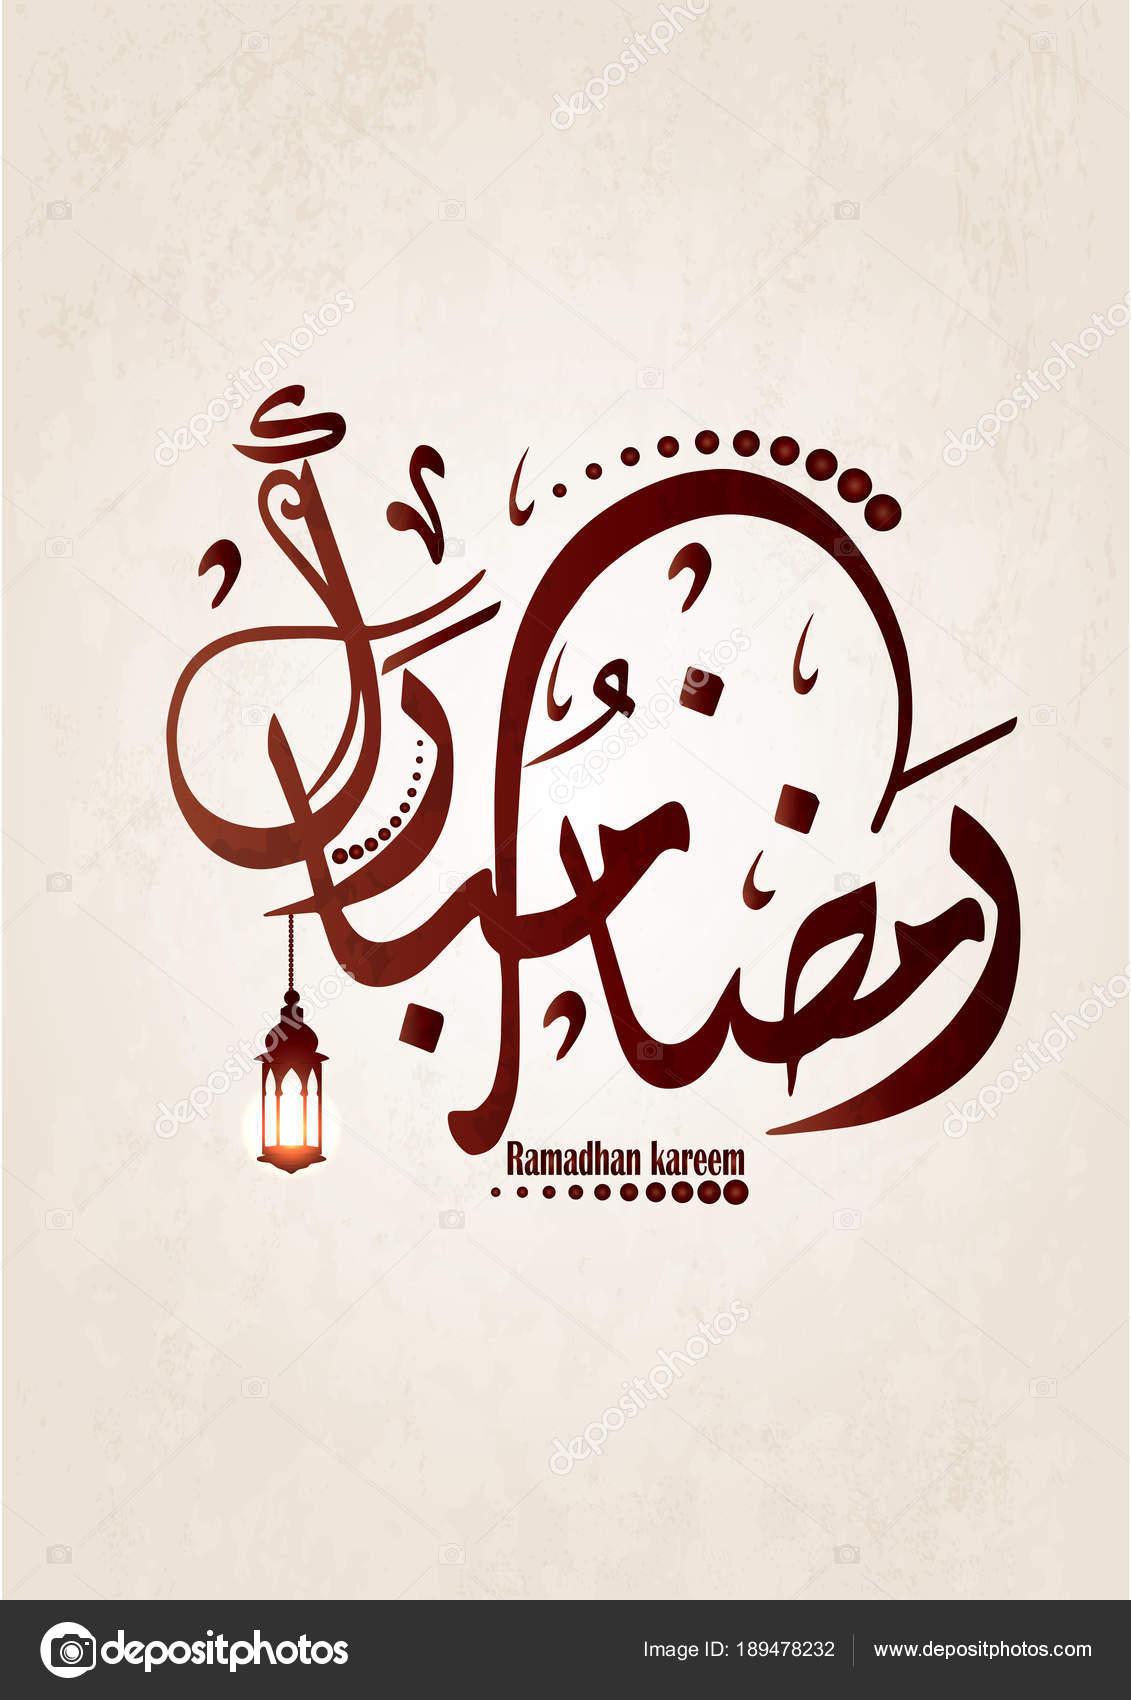 ramadan kareem greeting card in creative arabic calligraphy ramadan karim greeting calligraphic script font vector illustration